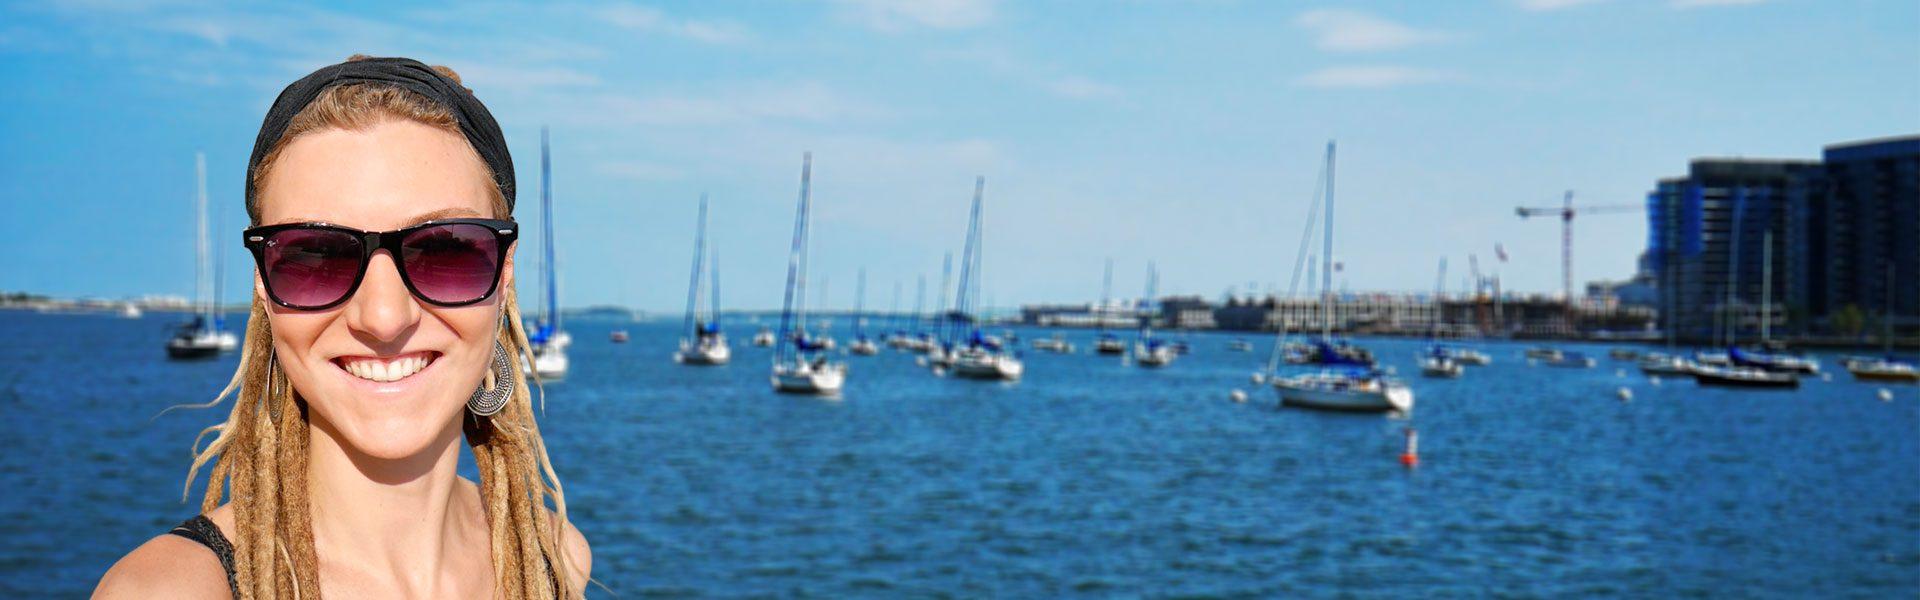 Rasta girl at Boston Harbor